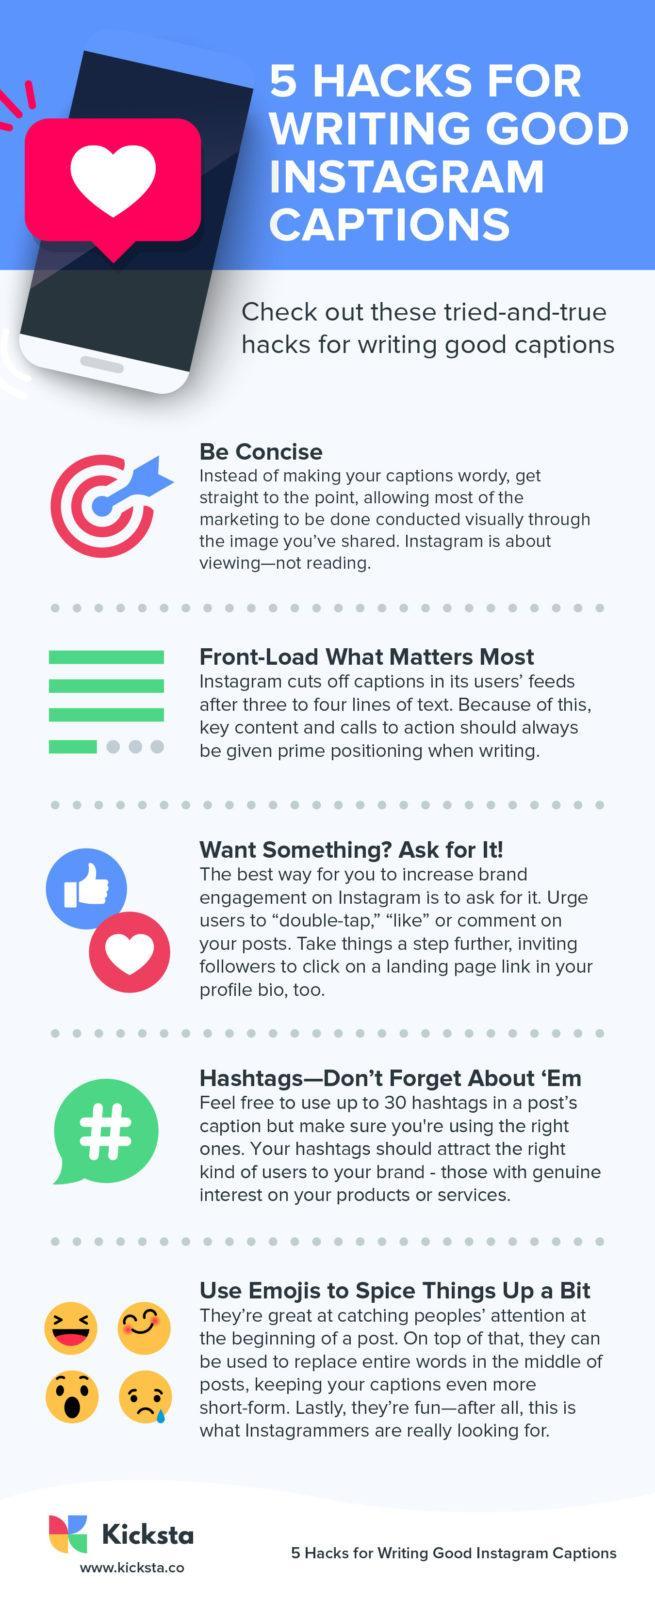 5 Hacks for Writing good Instagram Captions